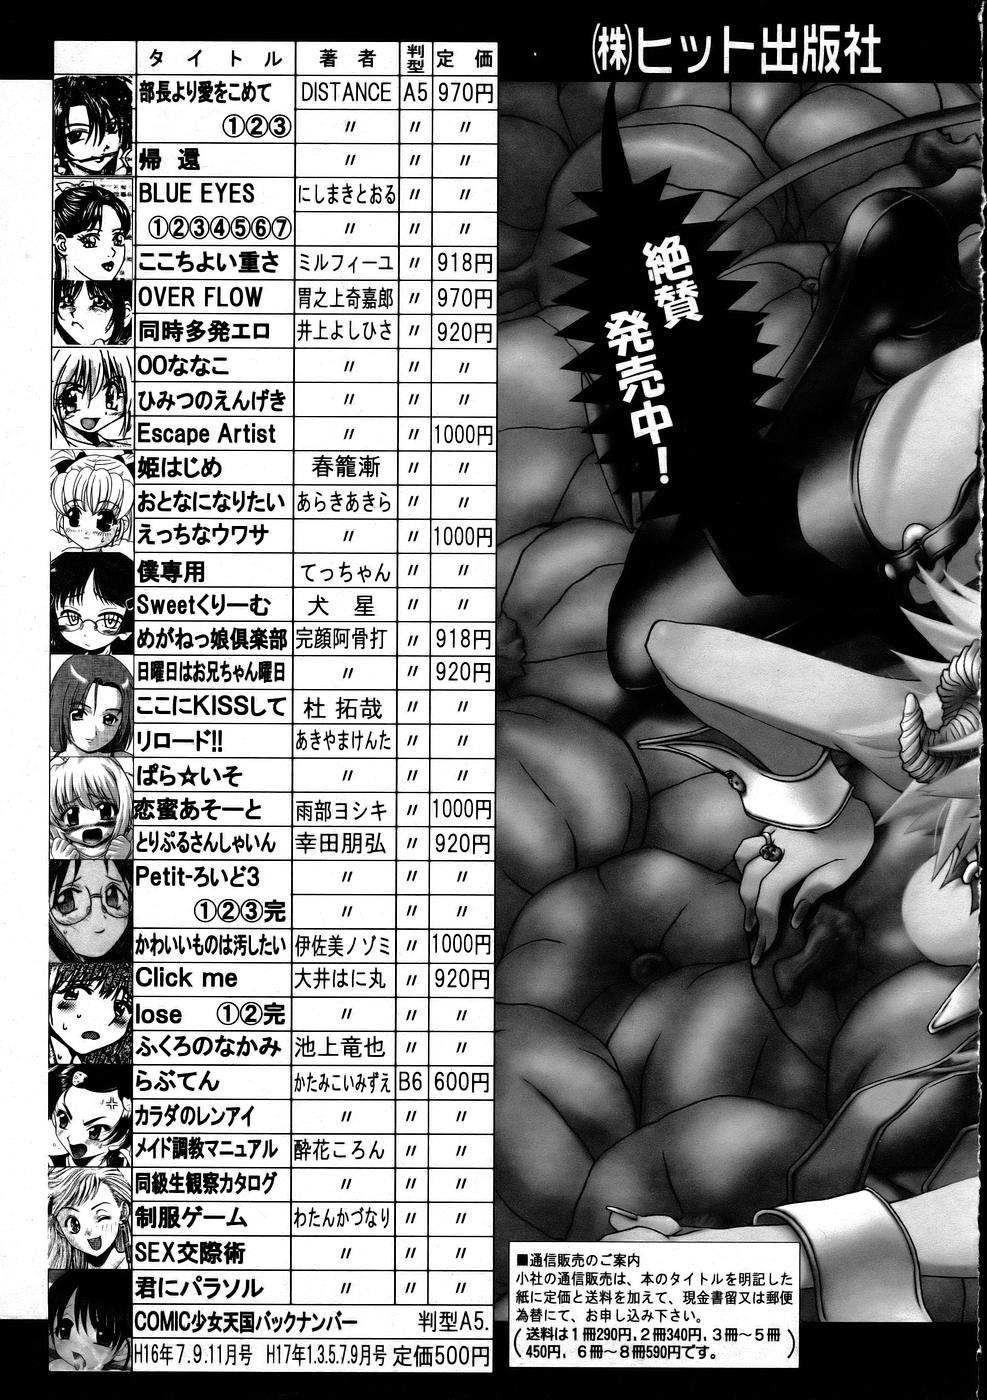 COMIC AUN 2005-10 Vol. 113 371